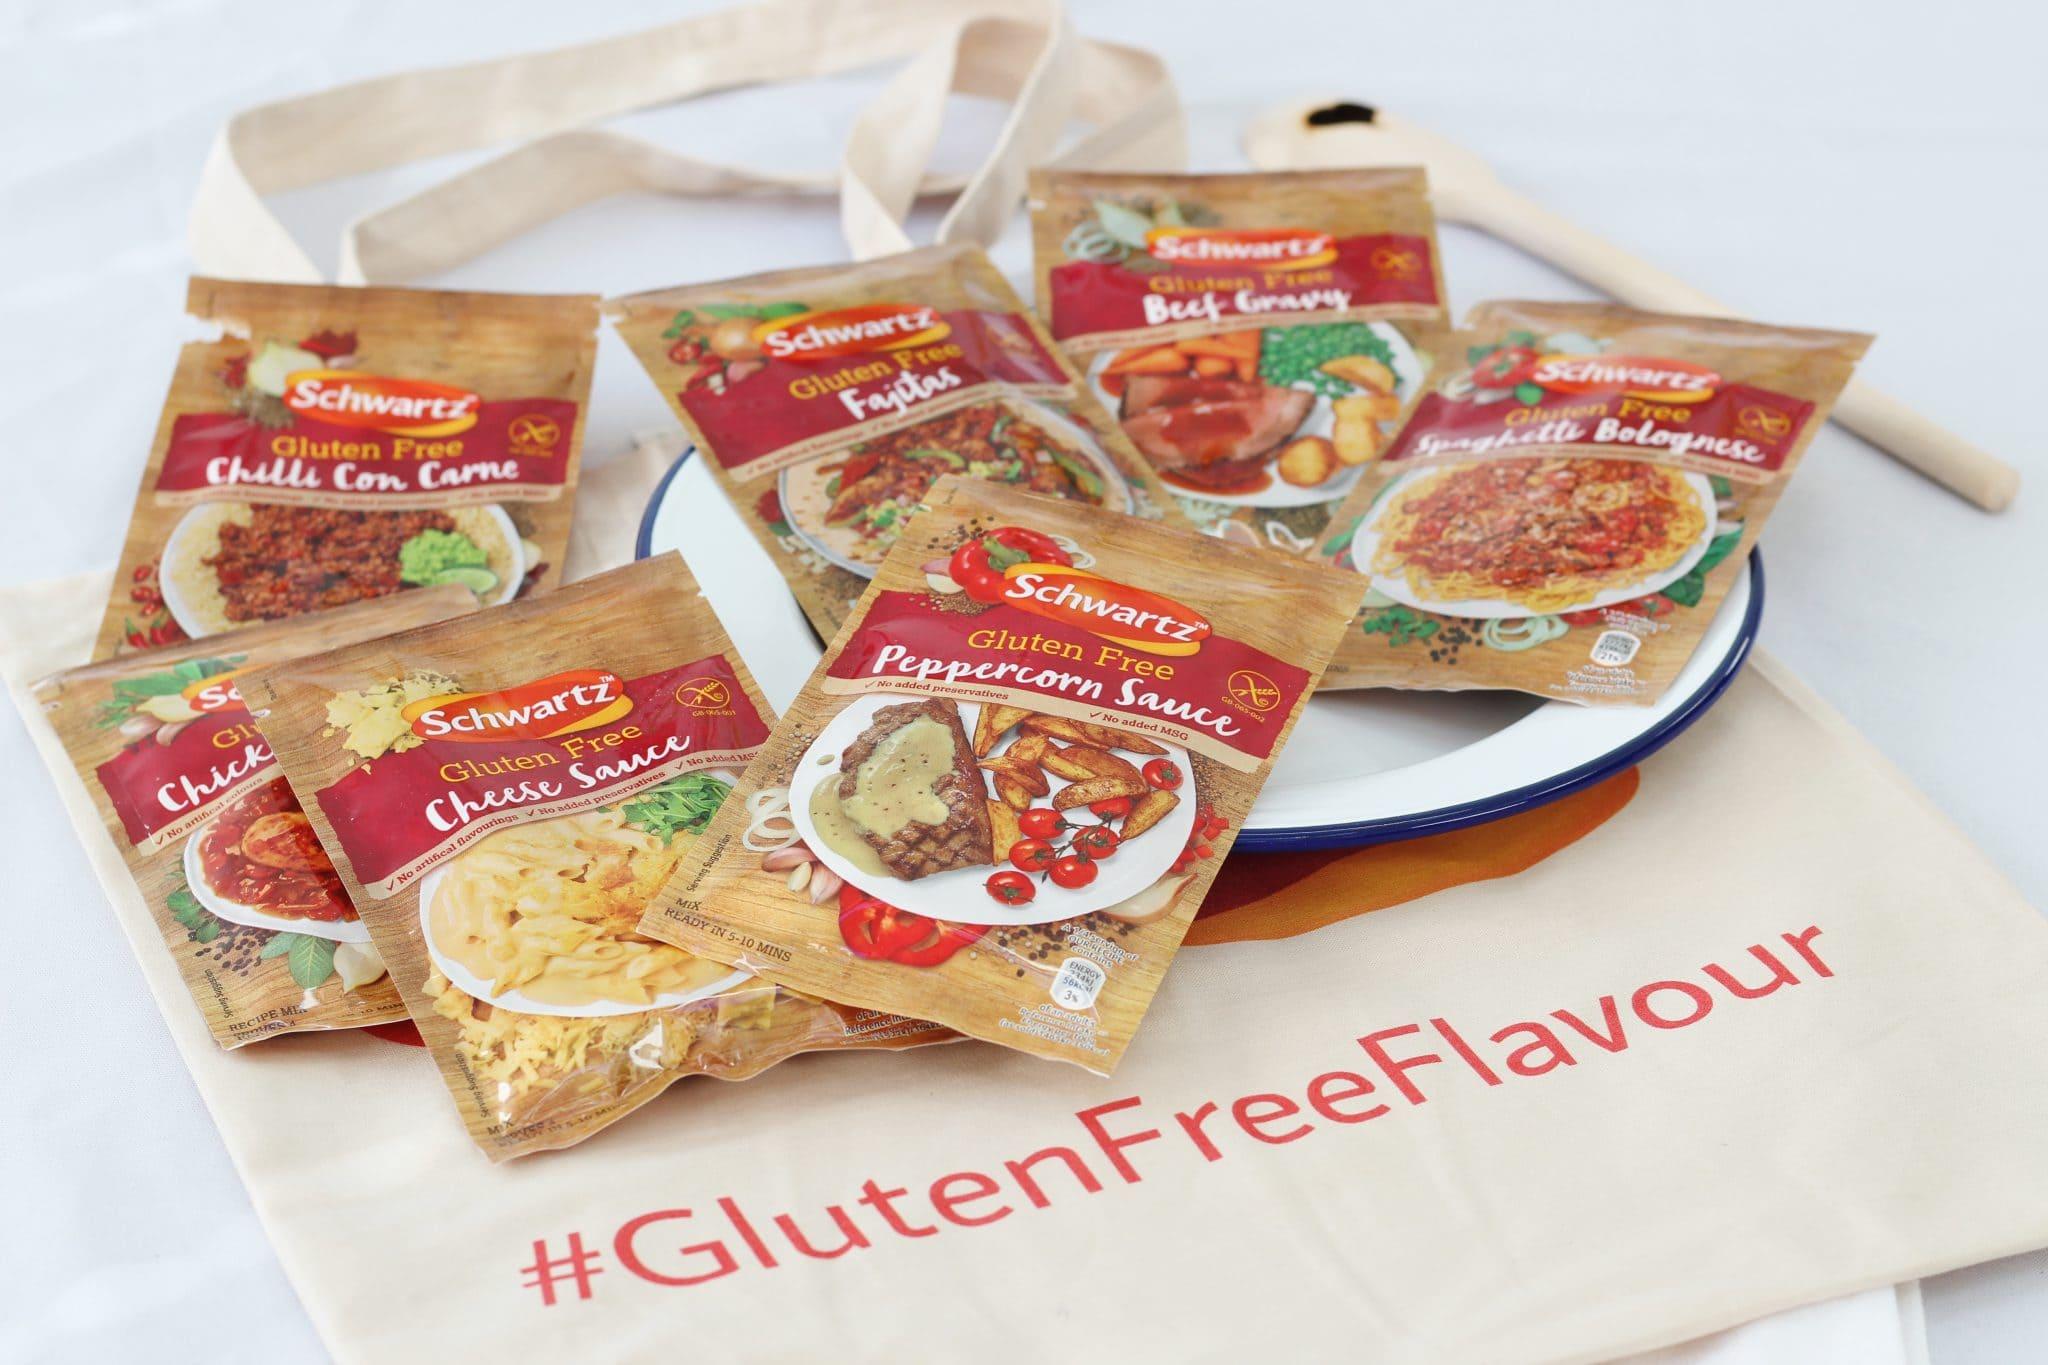 Schwartz gluten free recipe mixes